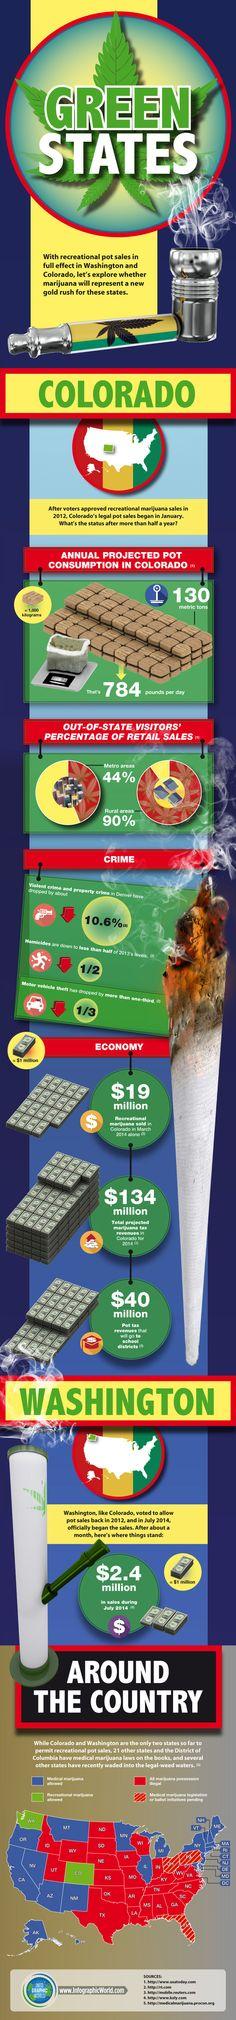 Green States #infographic #Marijuana #Drugs #Colorado #Washington